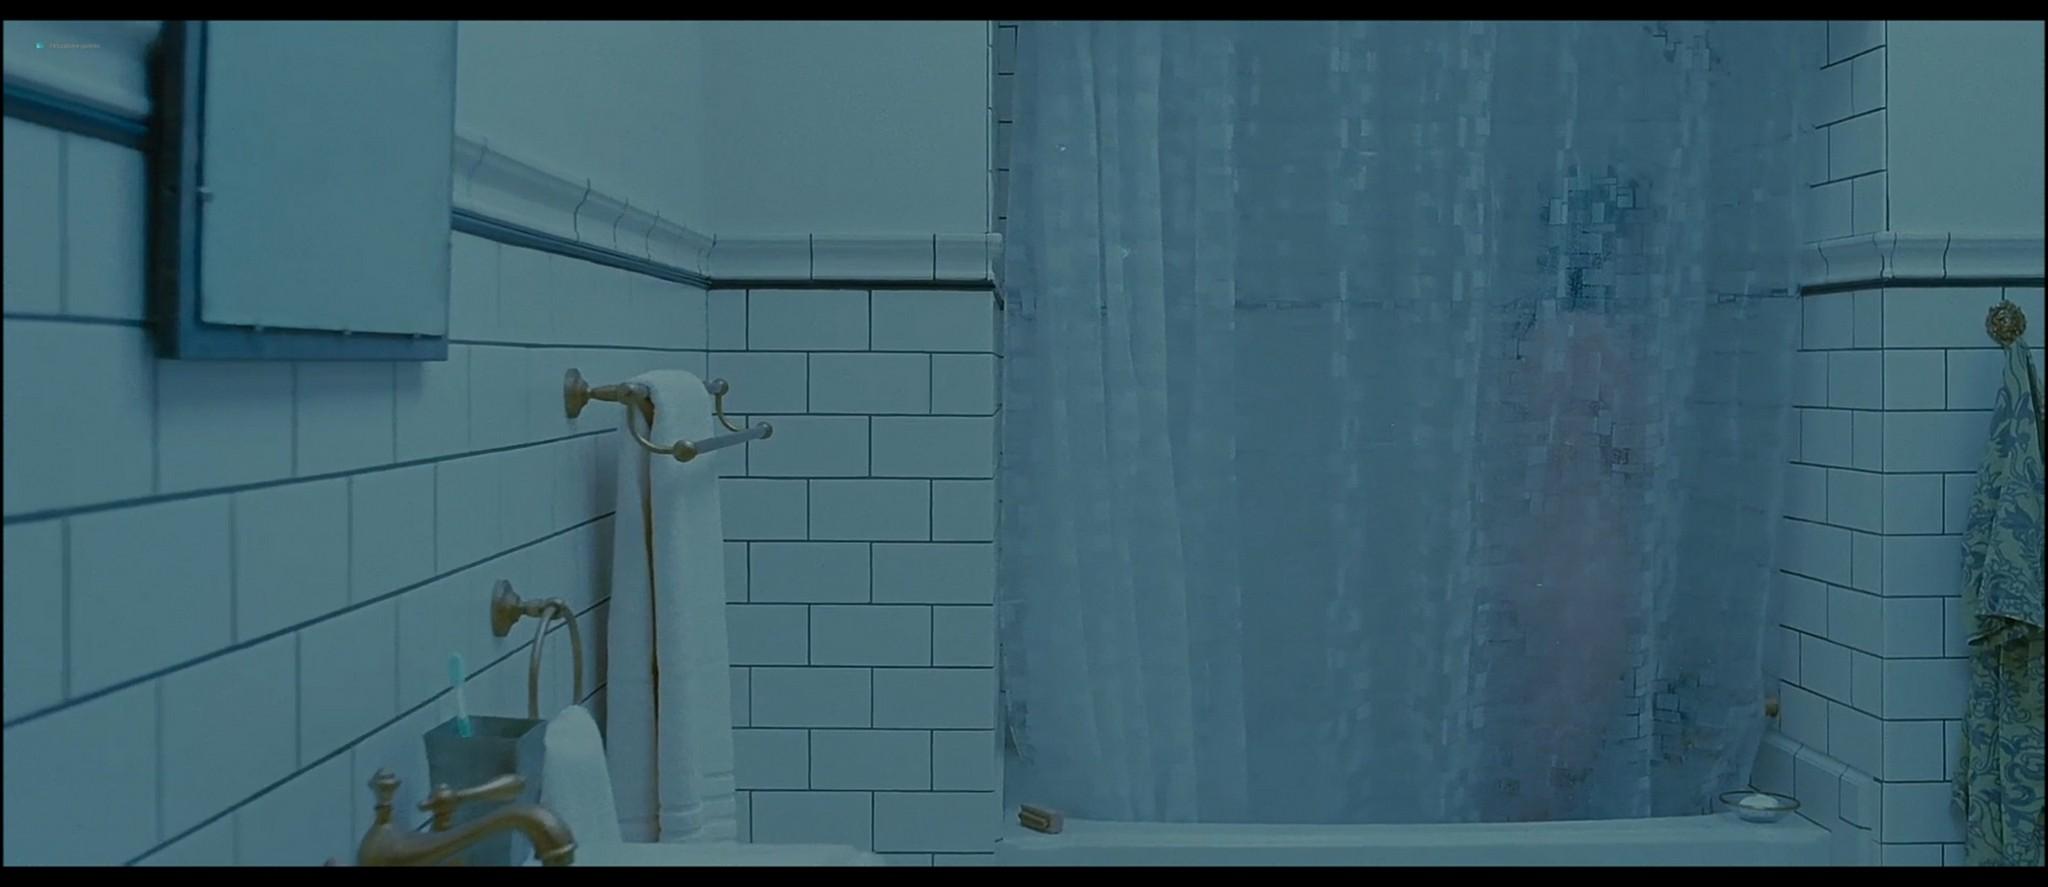 Mia Wasikowska nude nipple peak and butt while masturbating nude in the shower - Stoker (2013) HD 1080p BluRay (10)